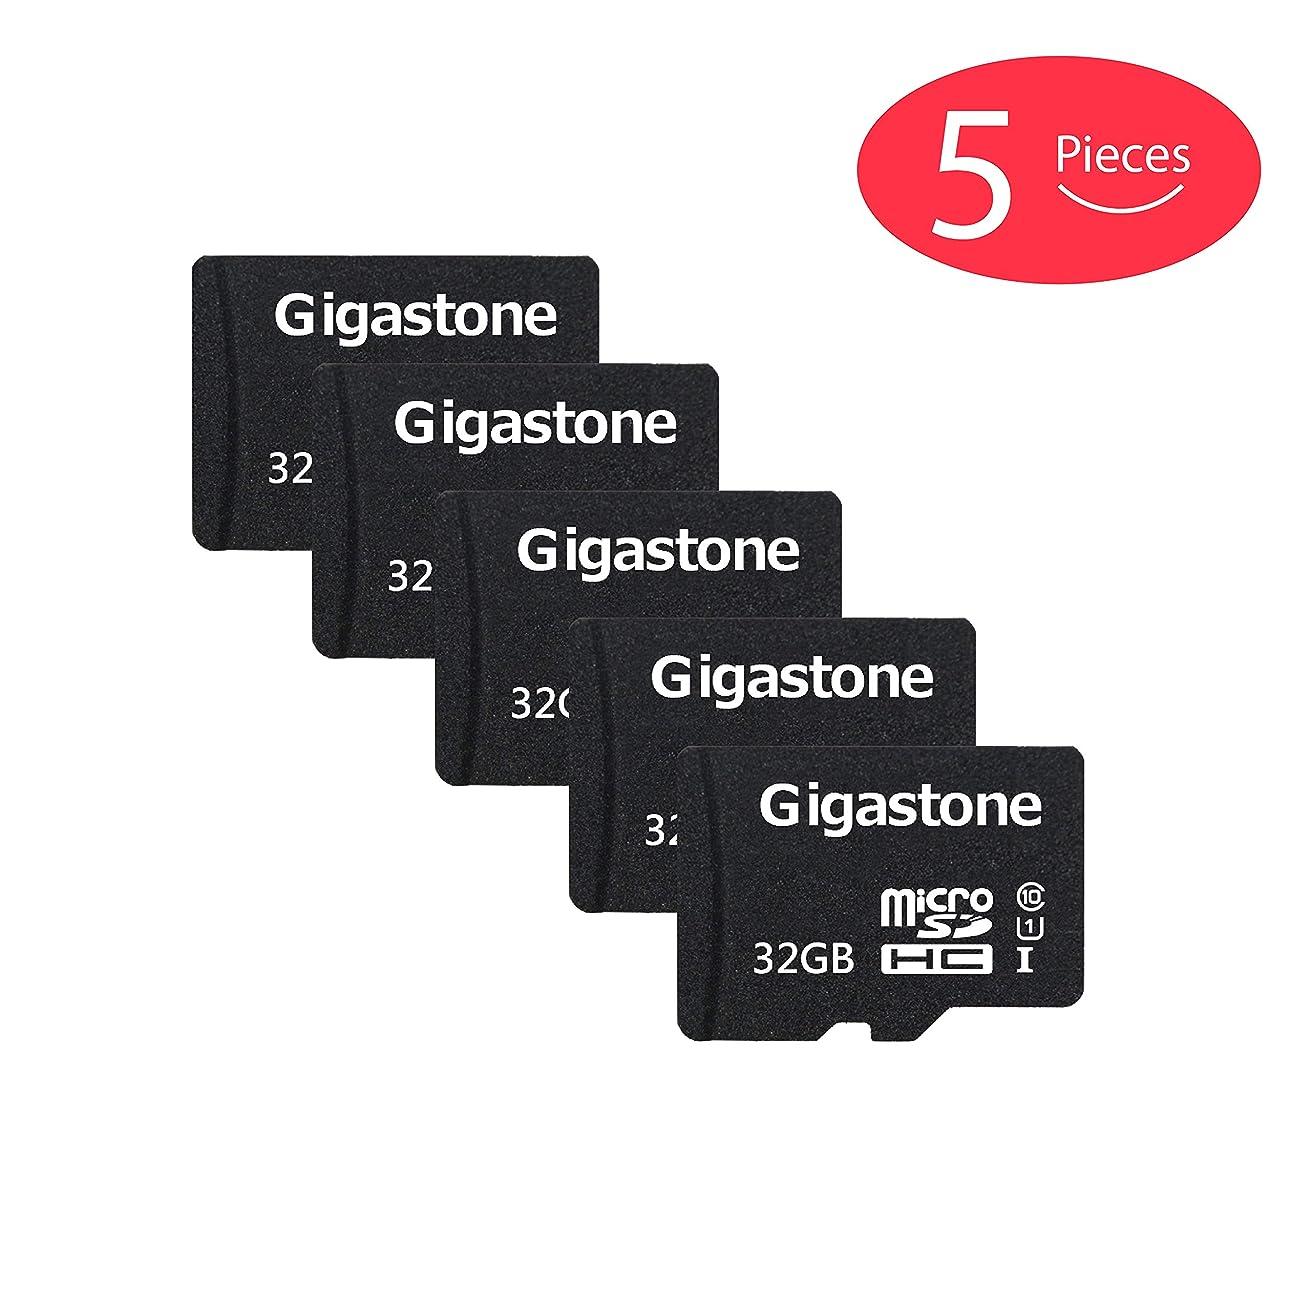 Gigastone Micro SD Card 32GB 5-Pack Micro SDHC U1 C10 with Mini Case High Speed Memory Card Class10 Uhs Full HD Video Nintendo Gopro Camera Samsung Canon Nikon DJI Drone - Black